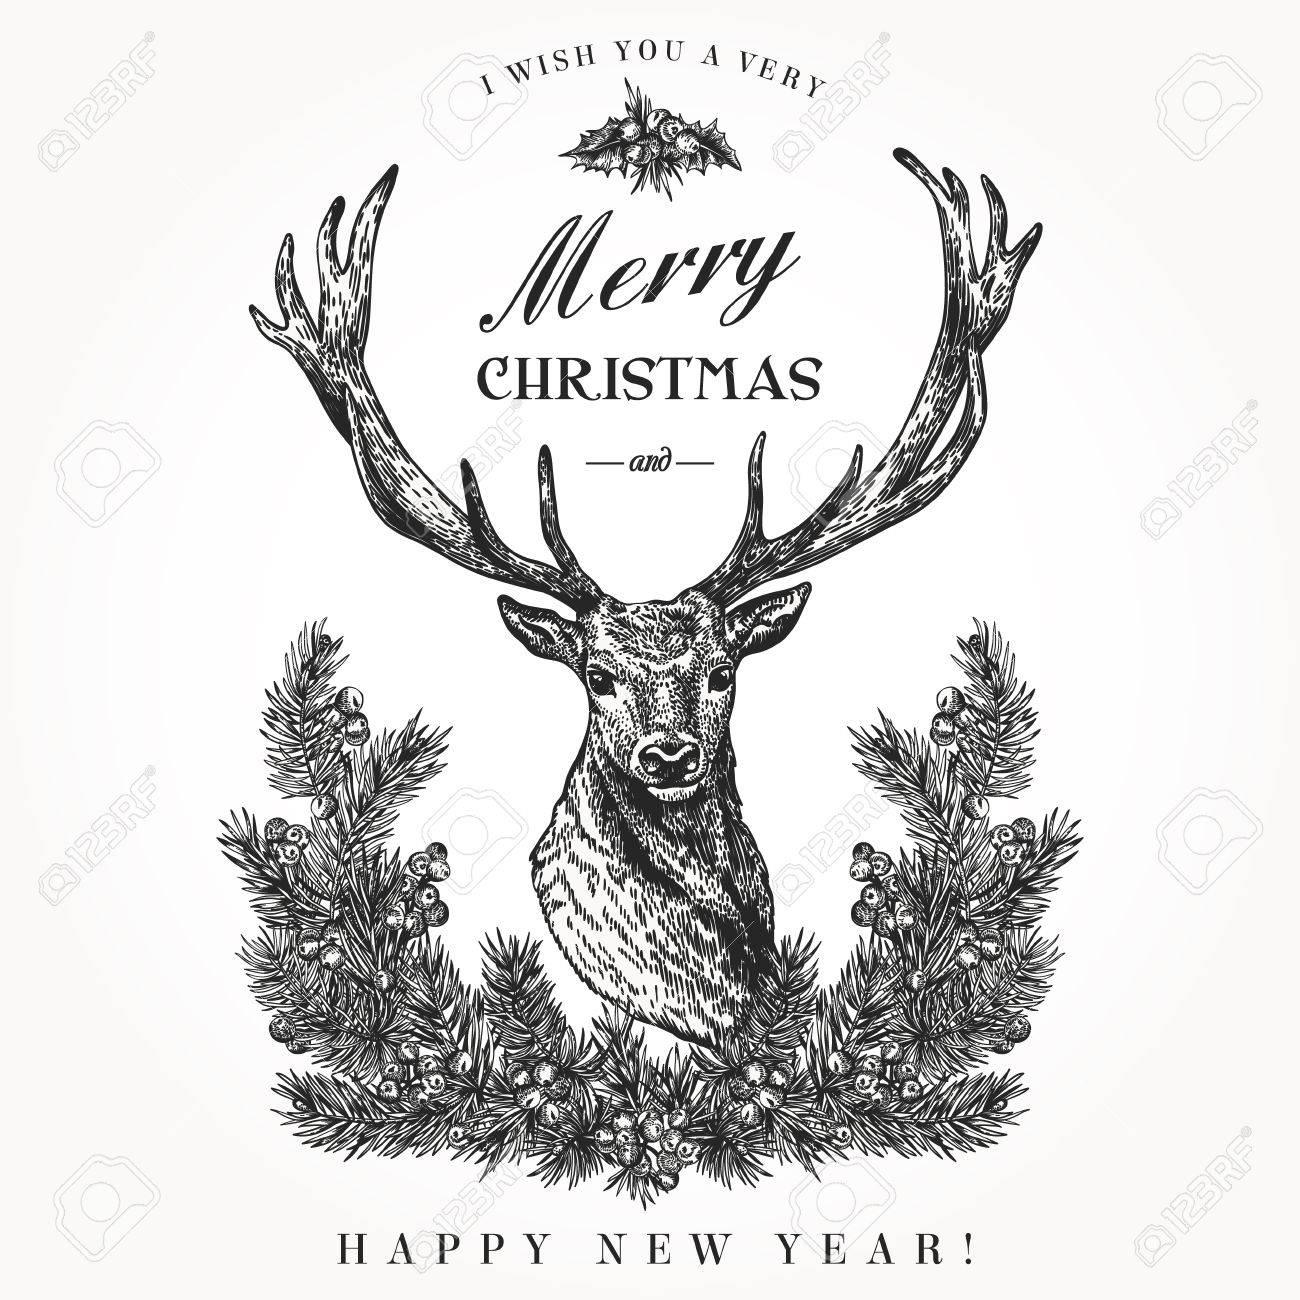 Vintage Christmas Card Deer And Pine Wreath Merry